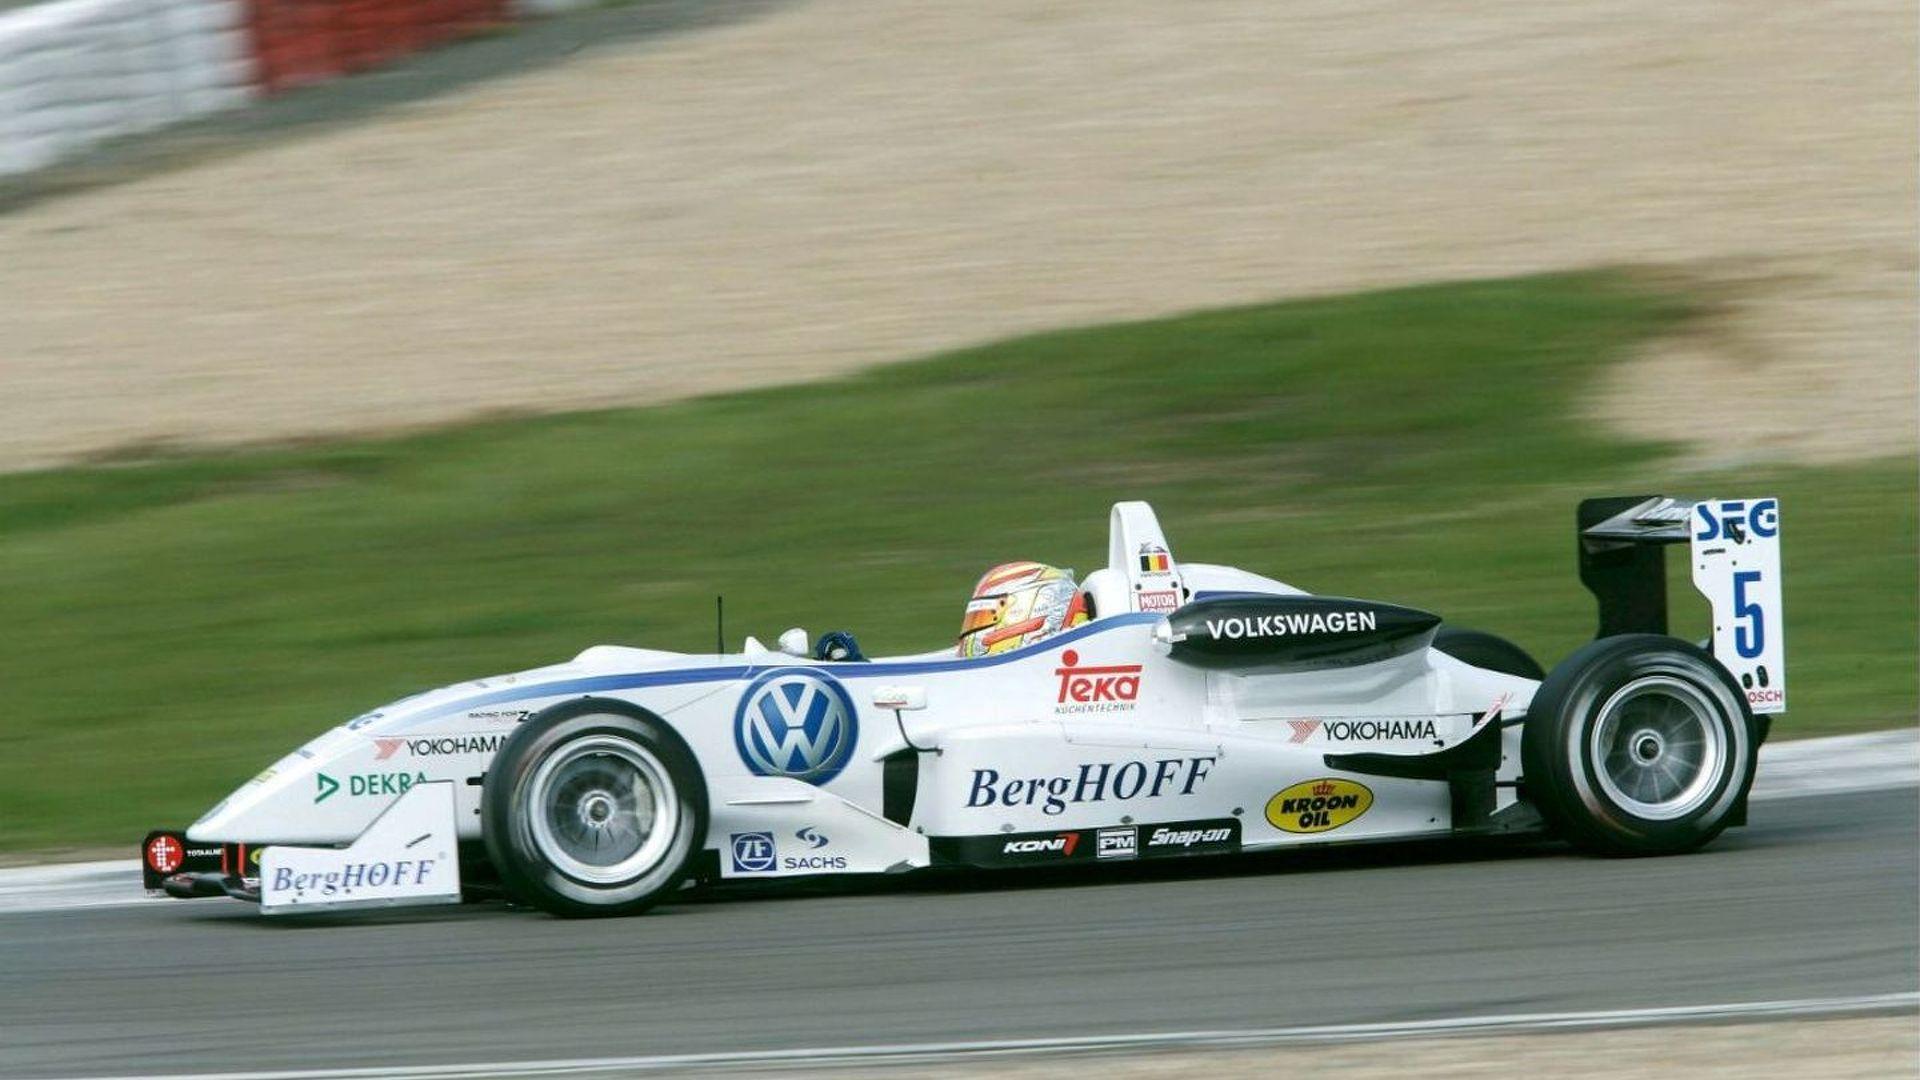 VW, Audi, Porsche play down F1 rumours